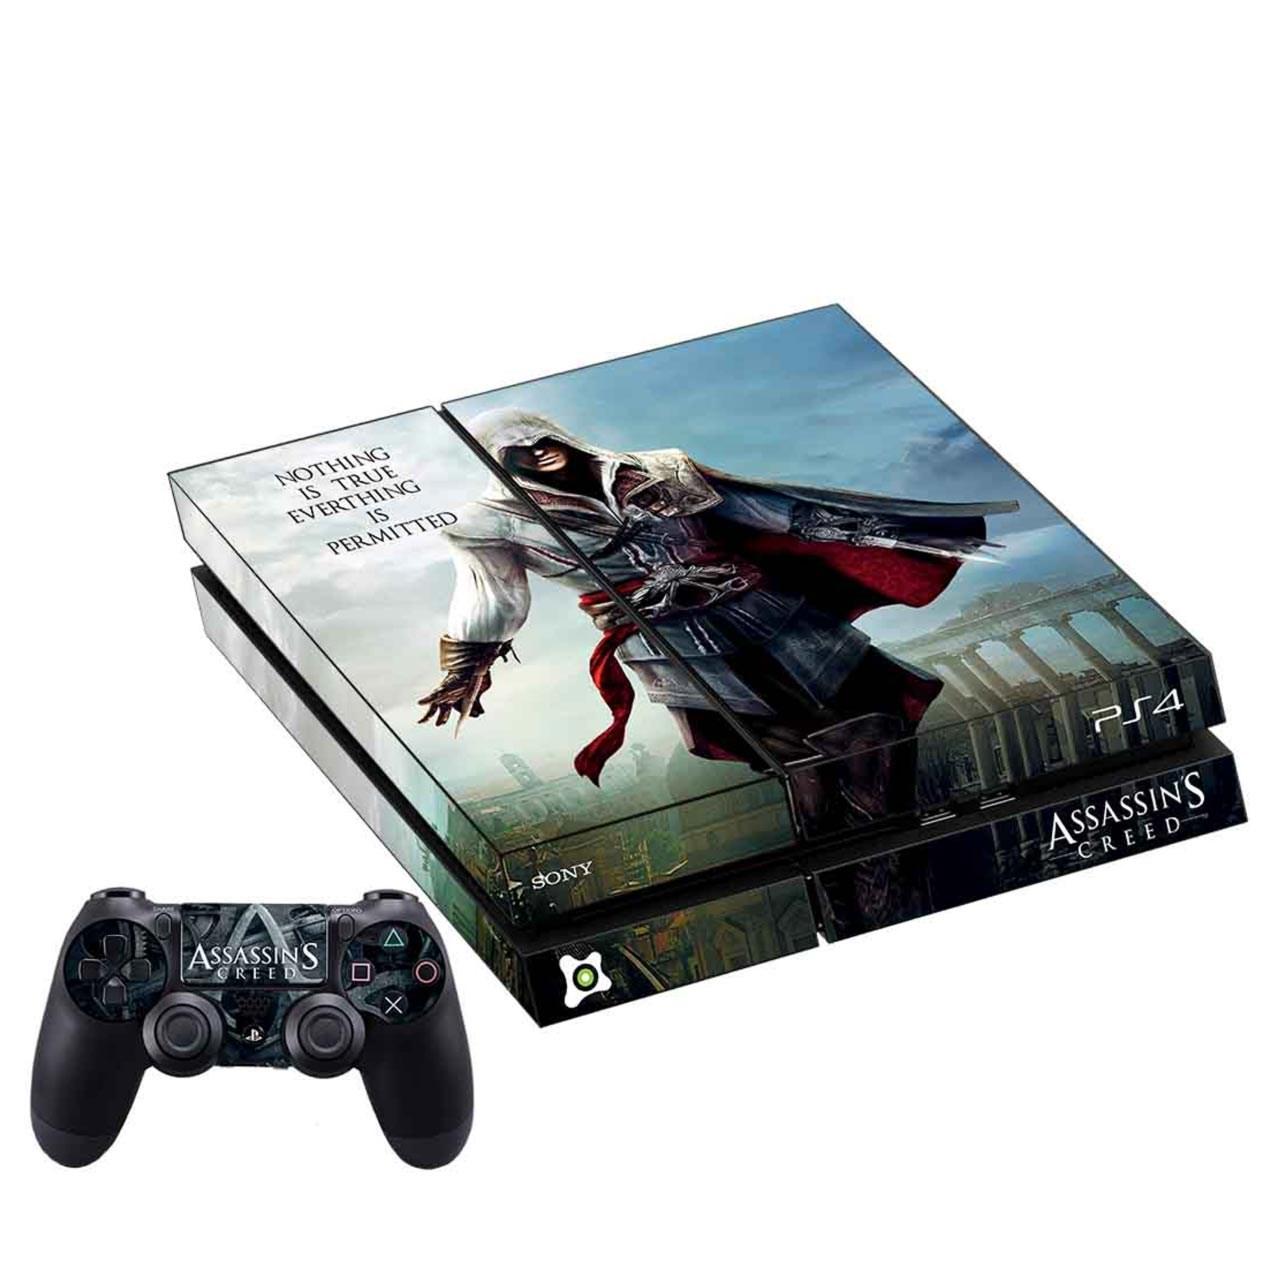 برچسب افقی پلی استیشن ۴ آی گیمر طرح Assassins Creed